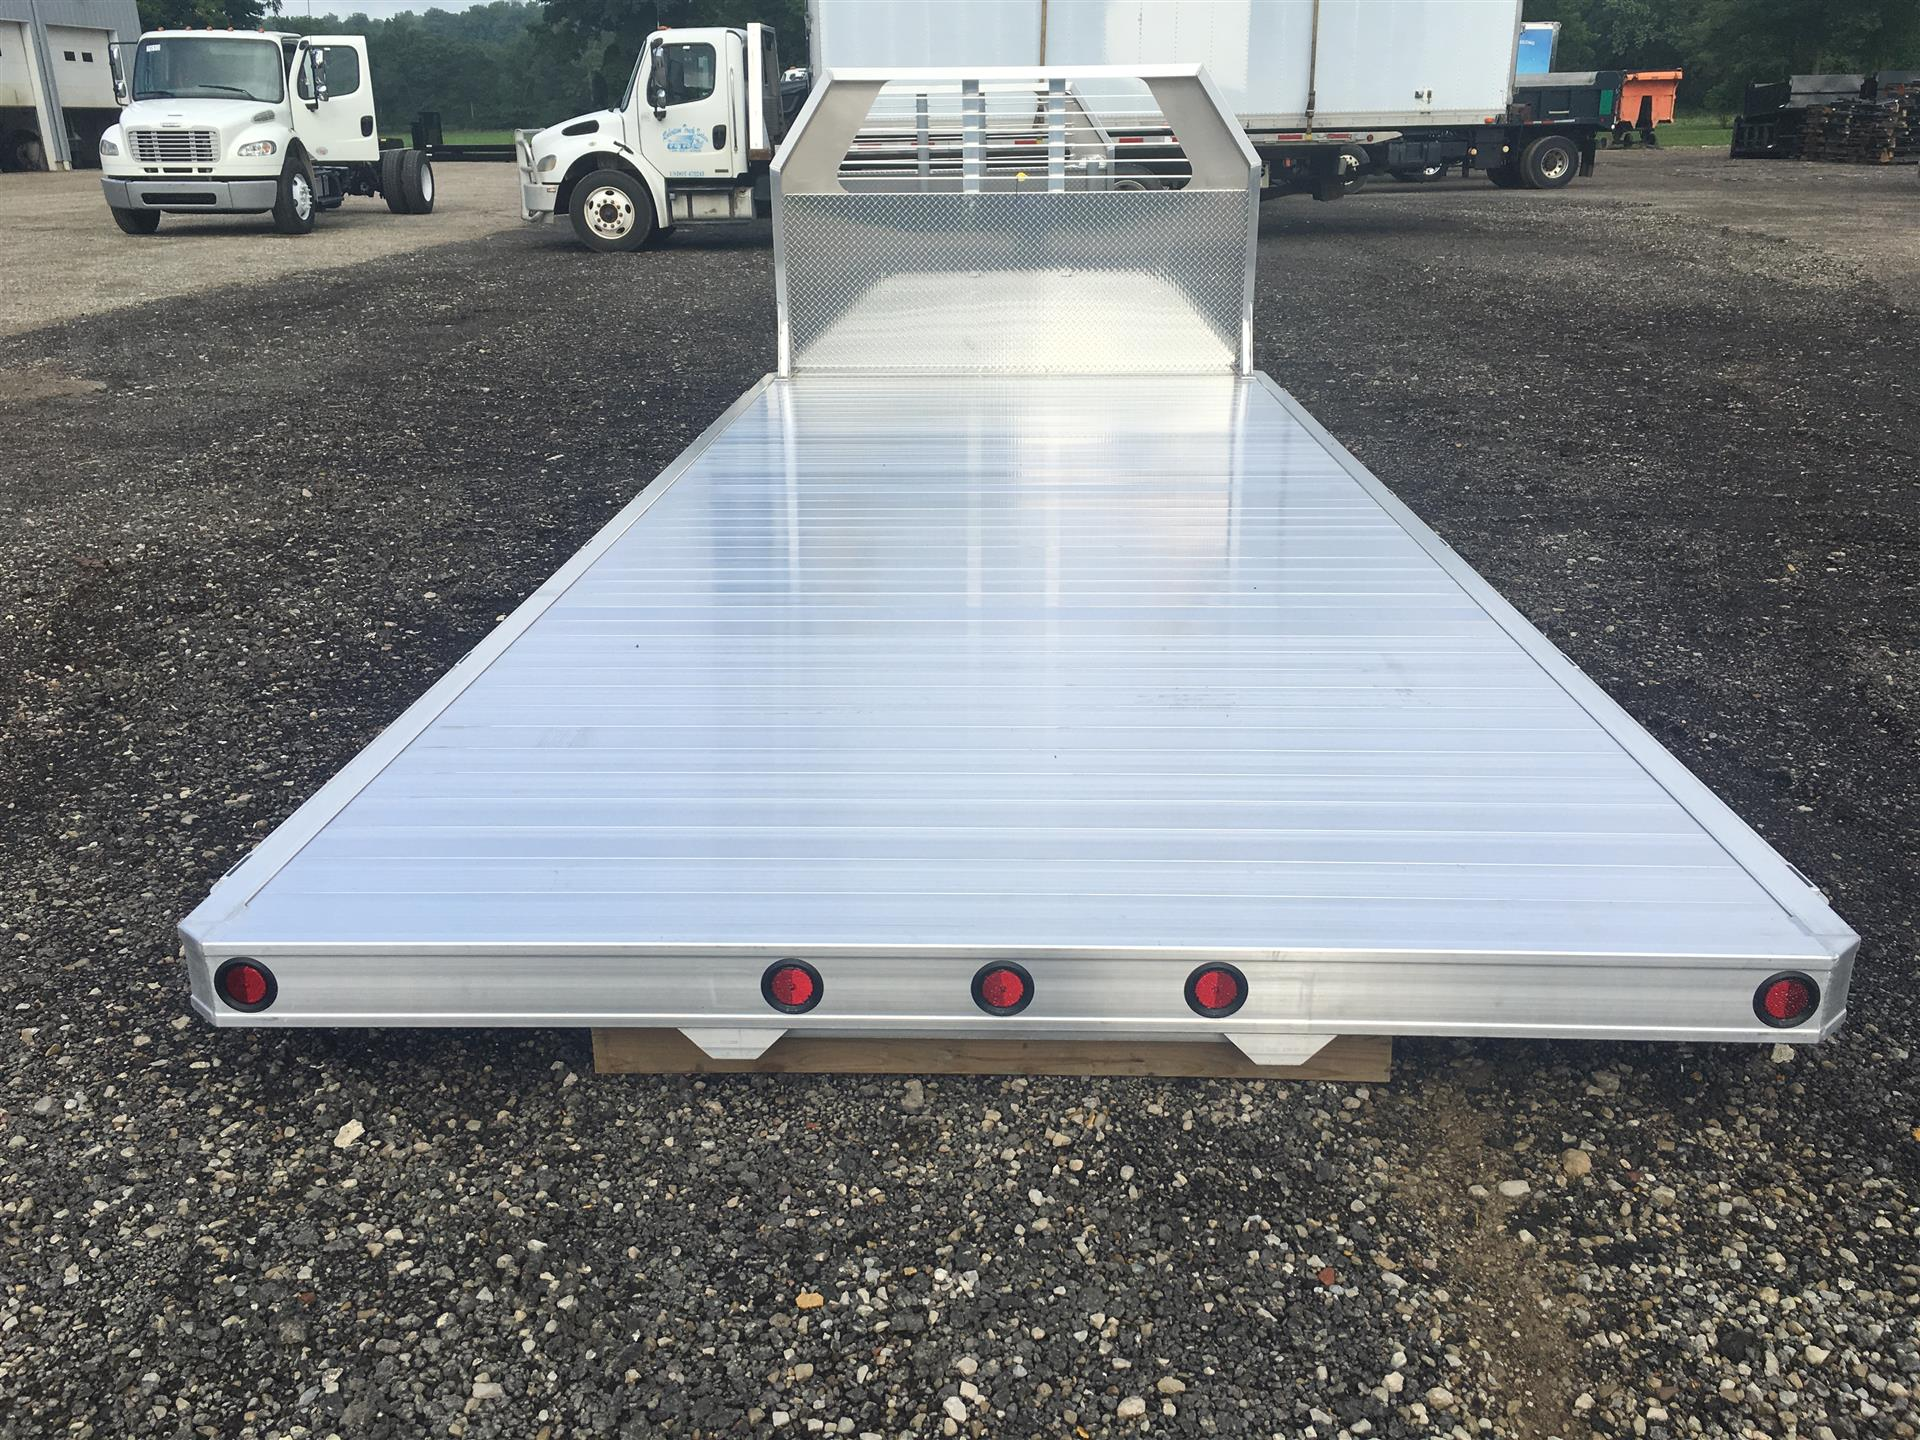 2018 Truckcraft- 18' Flatbed